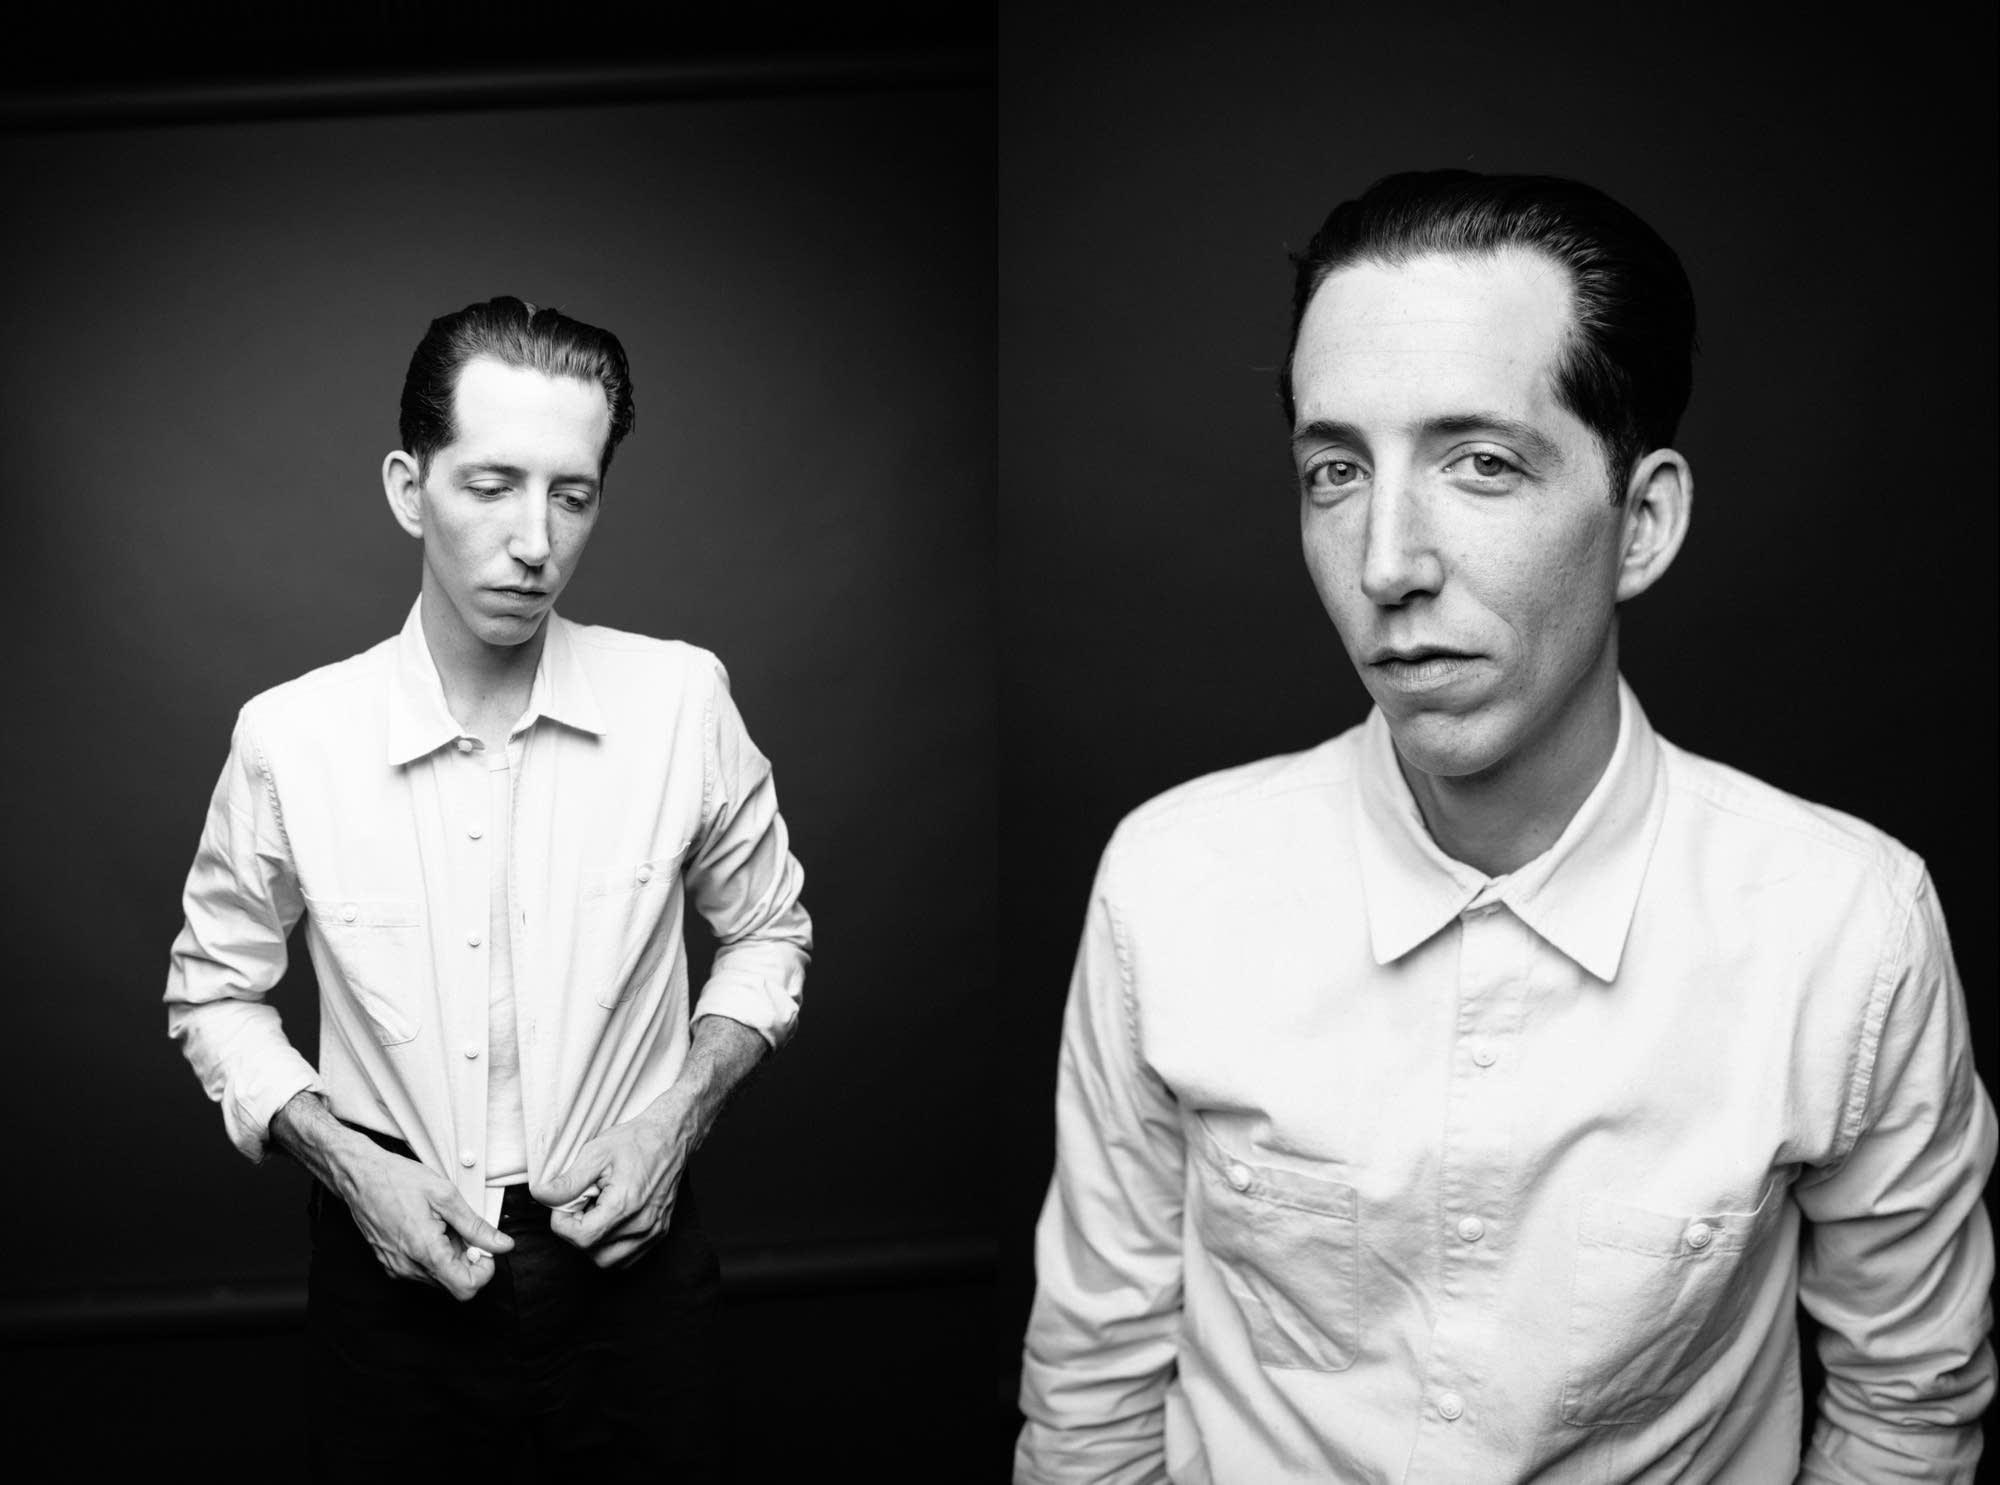 Pokey LaFarge portraits at The Current